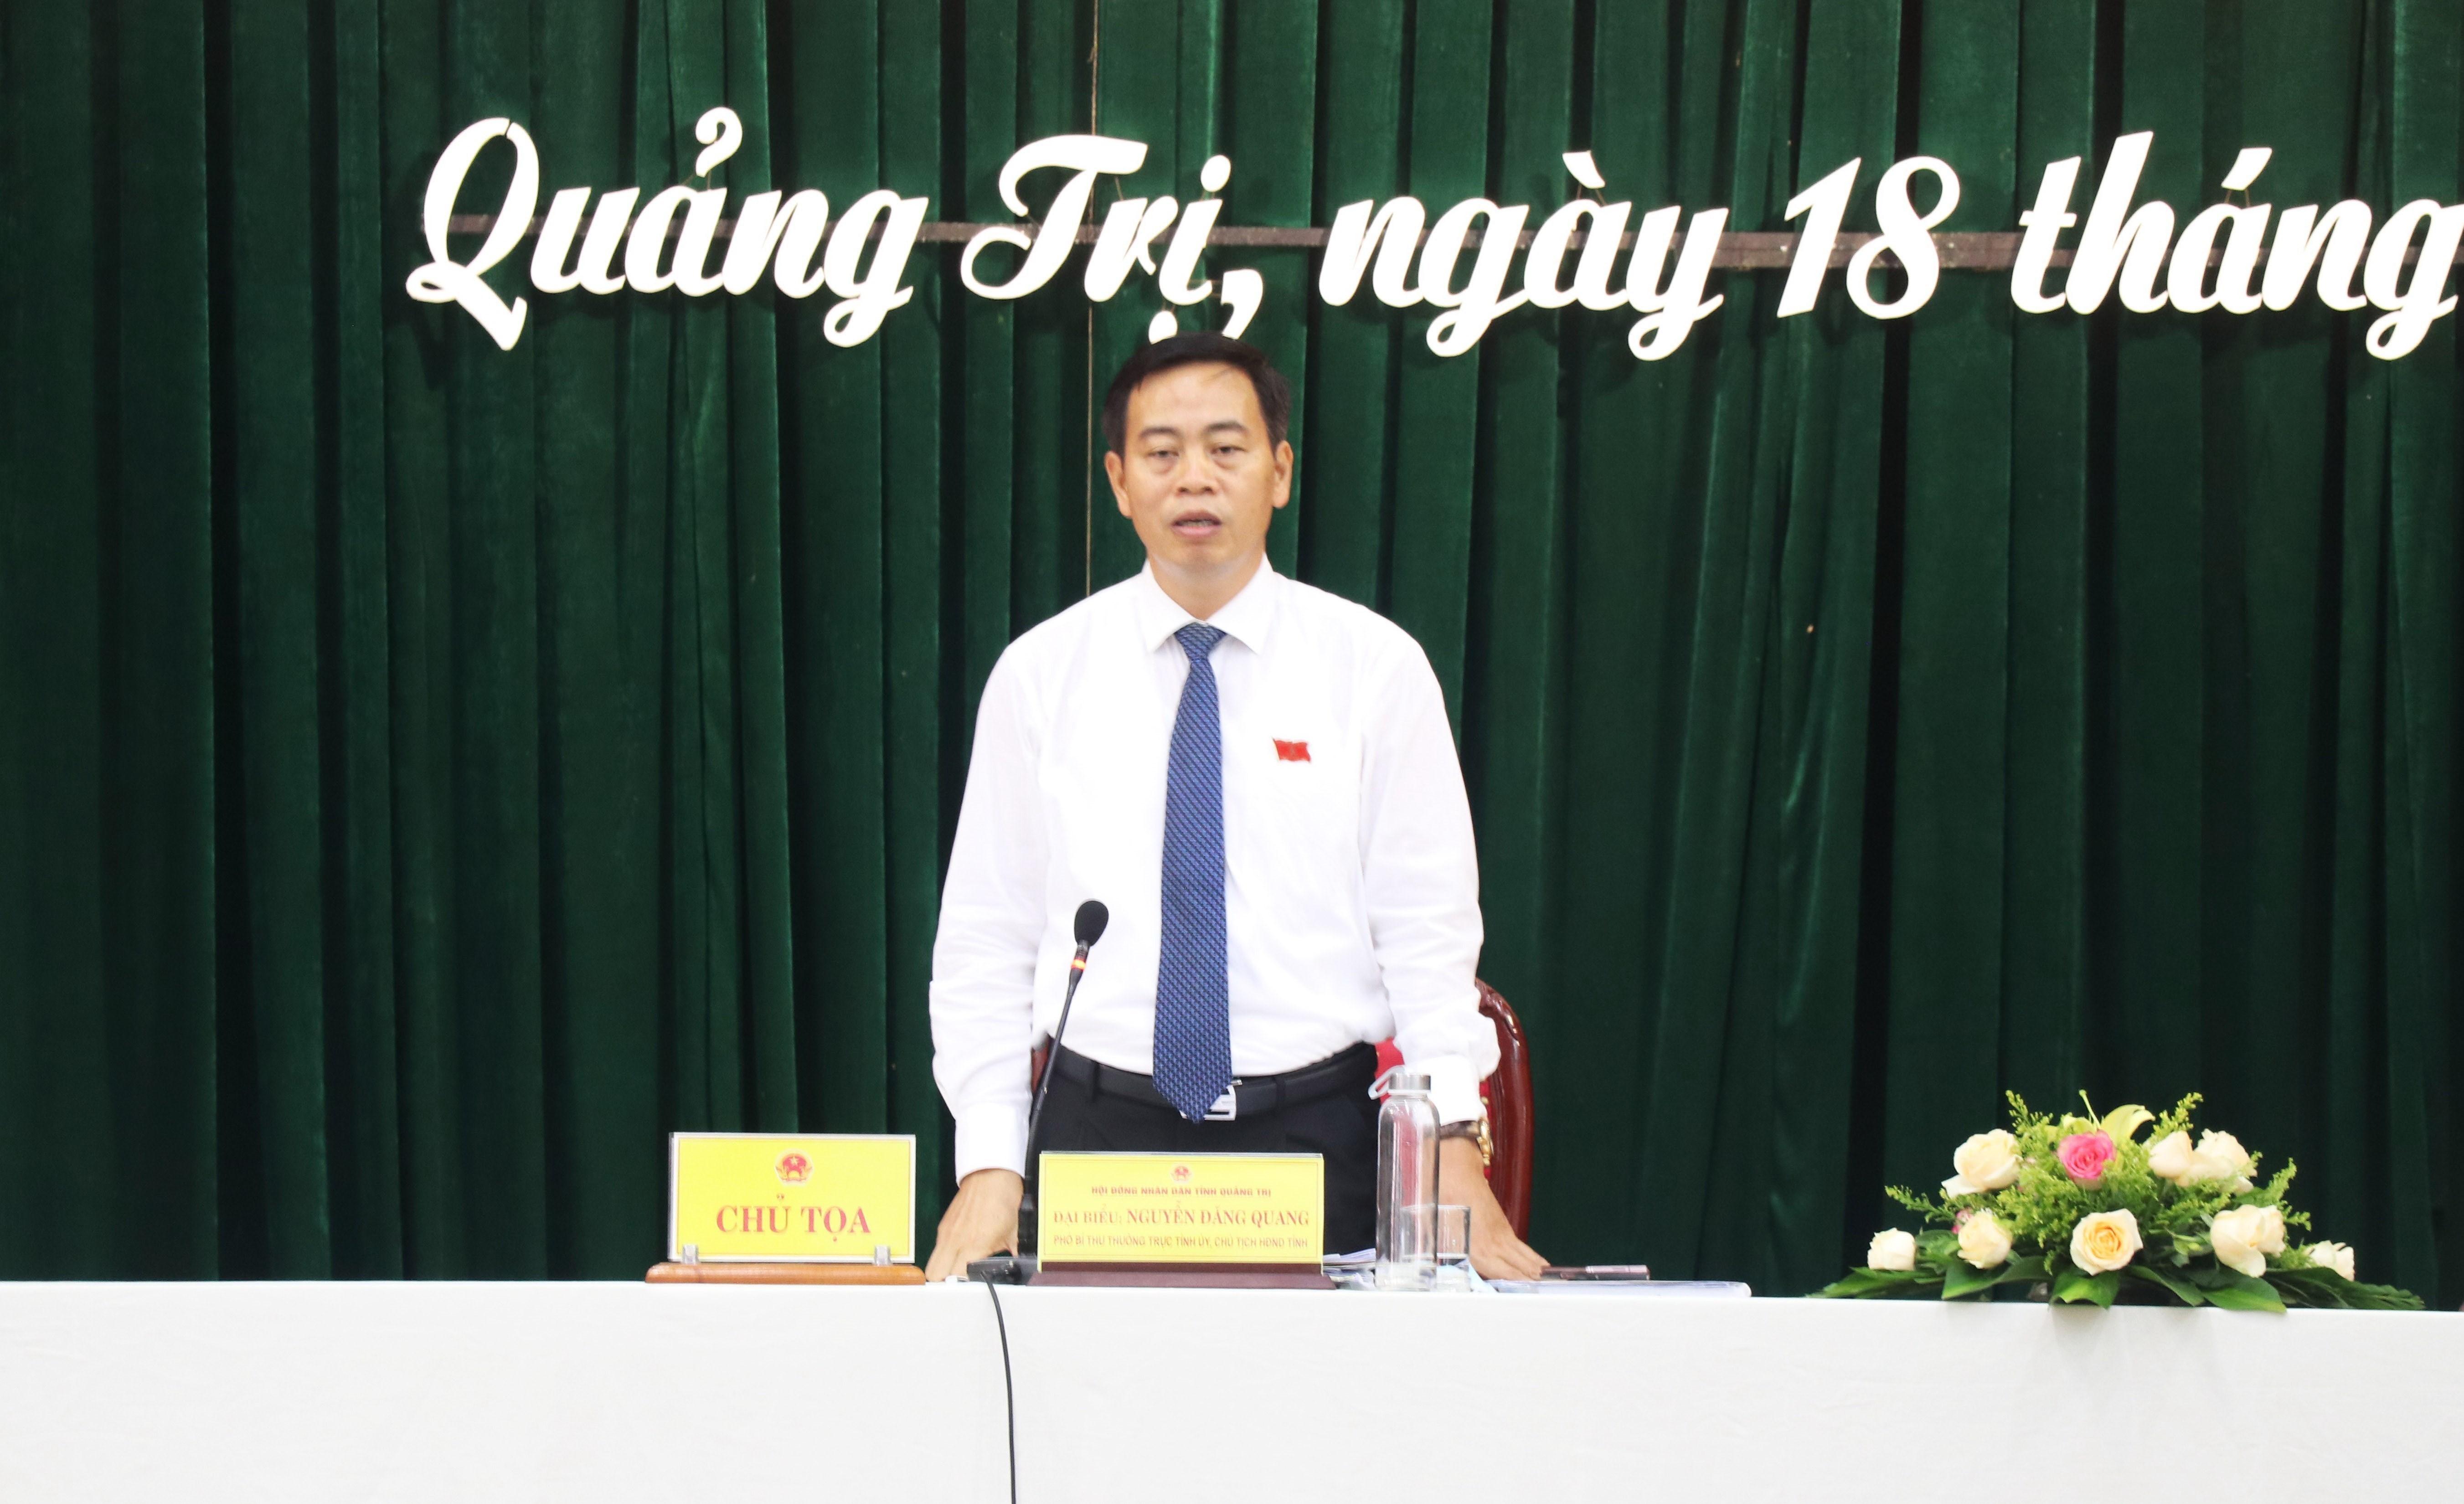 Ong Nguyen Dang Quang tai dac cu la Chu tich HDND tinh Quang Tri hinh anh 1